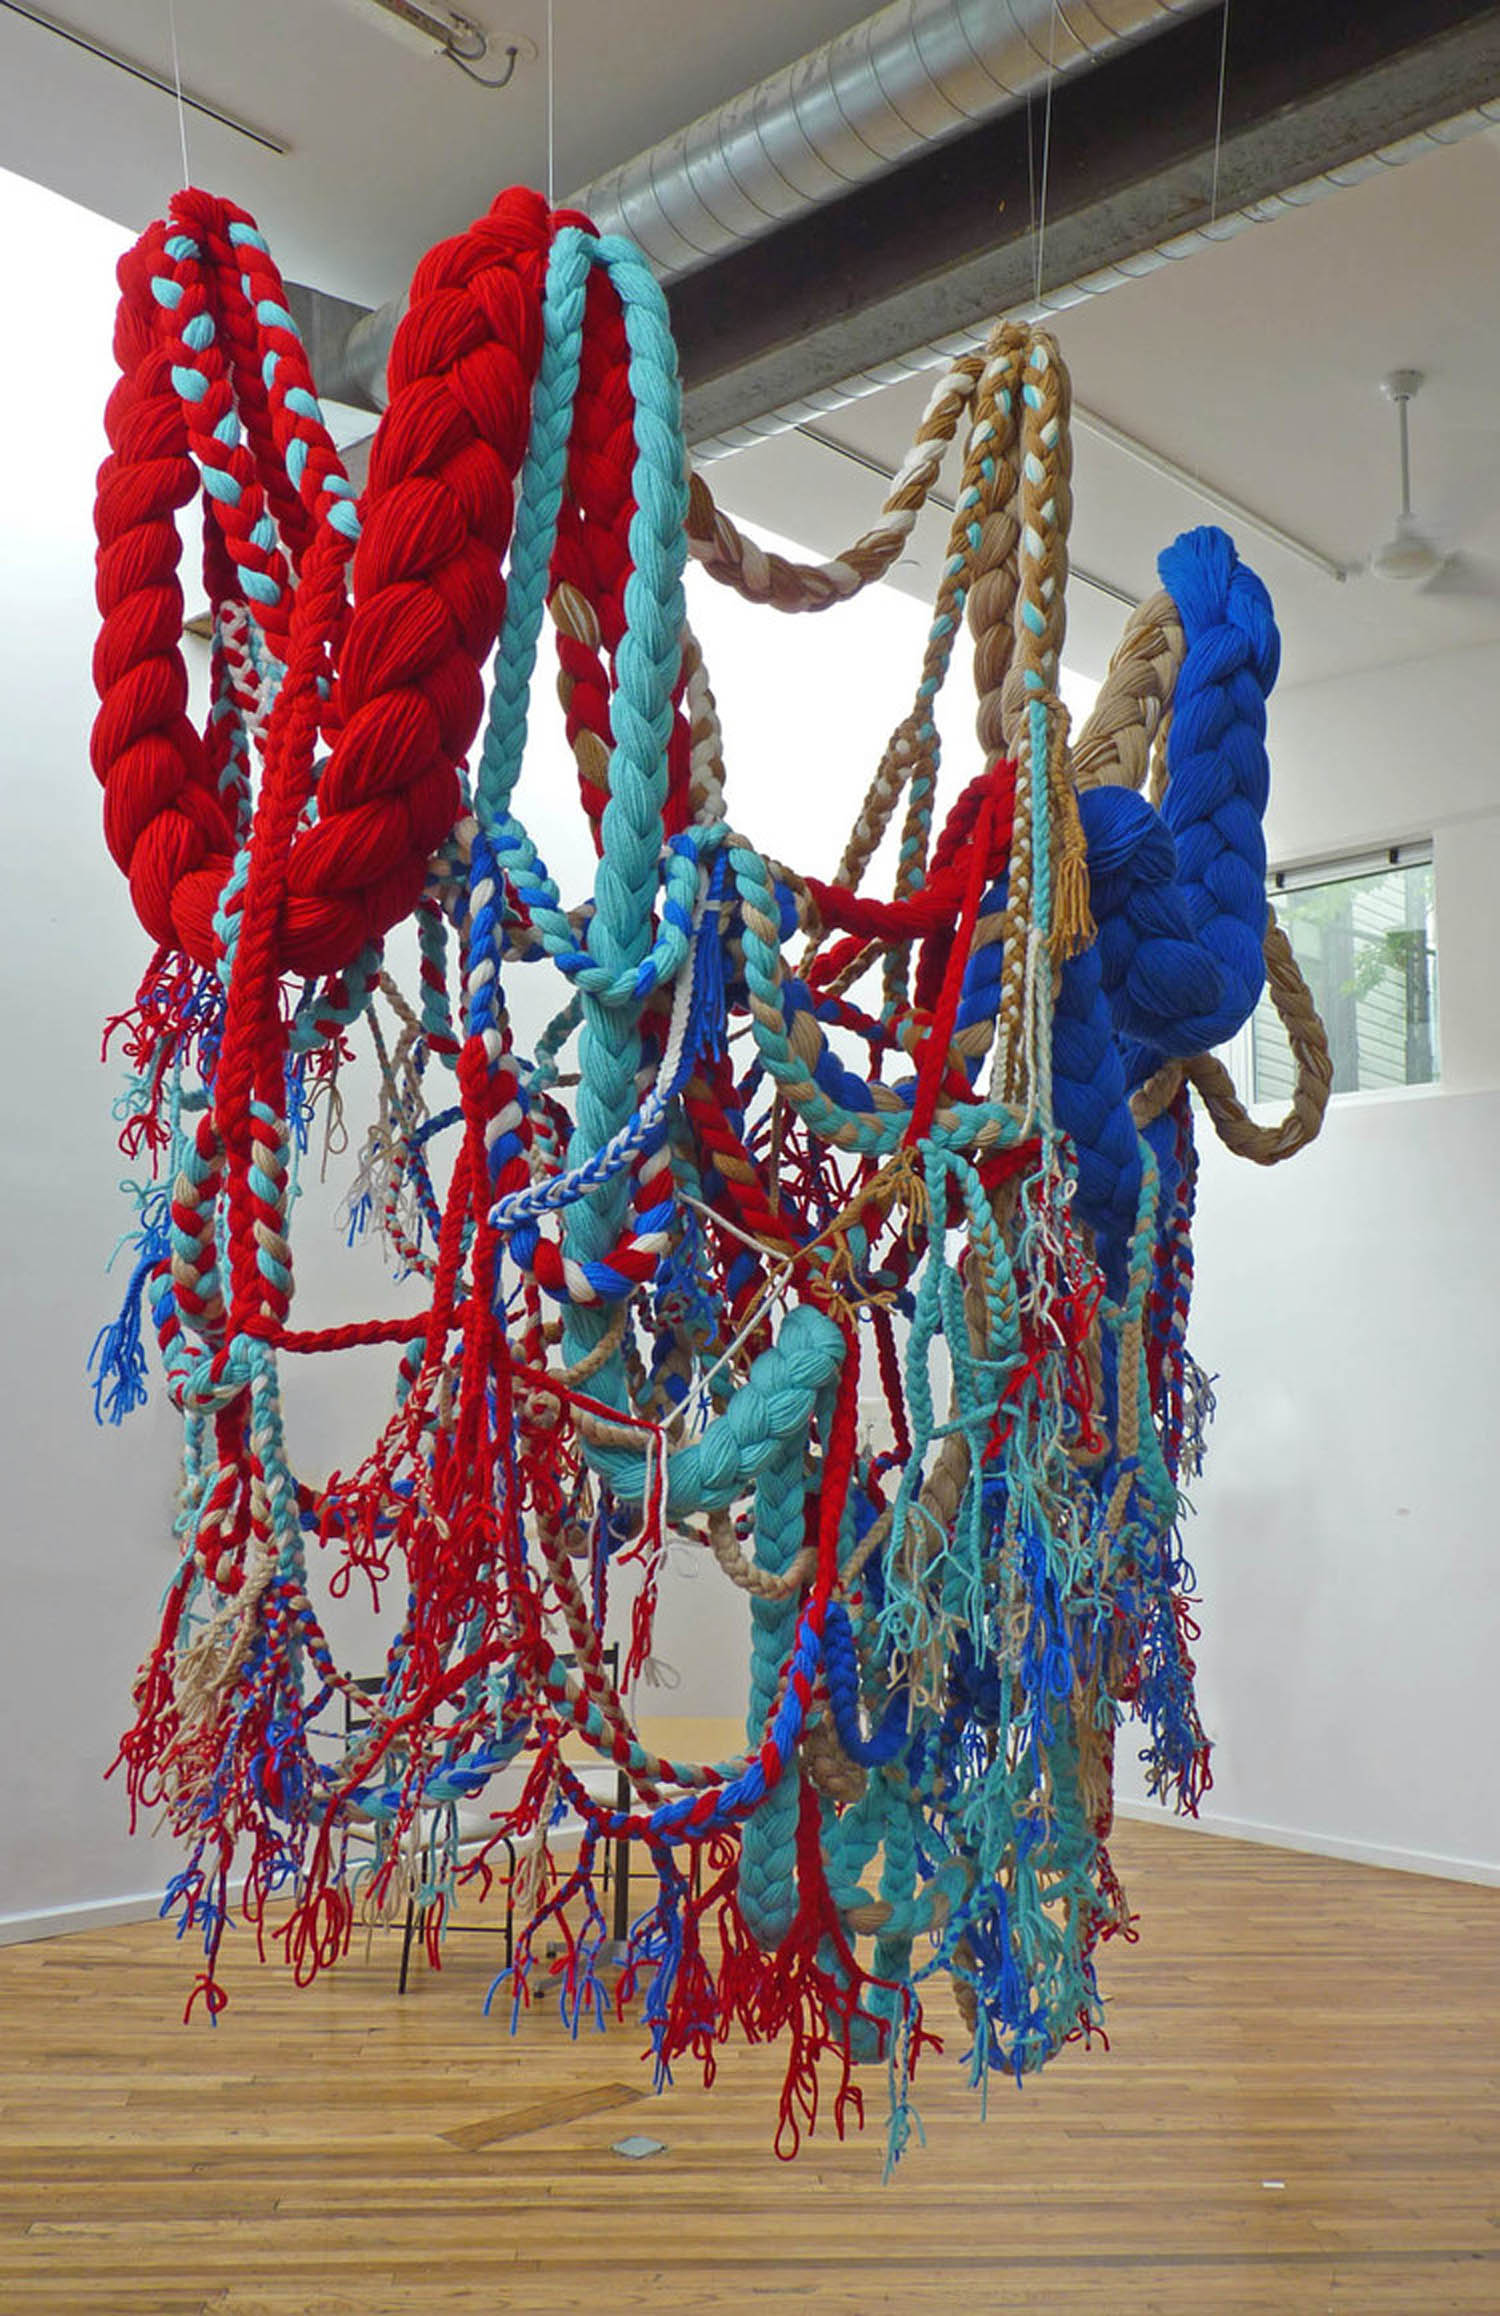 Historical Nostalgia, 2012, Acrylic yarn, 6' x 7' x 8' (Installation)